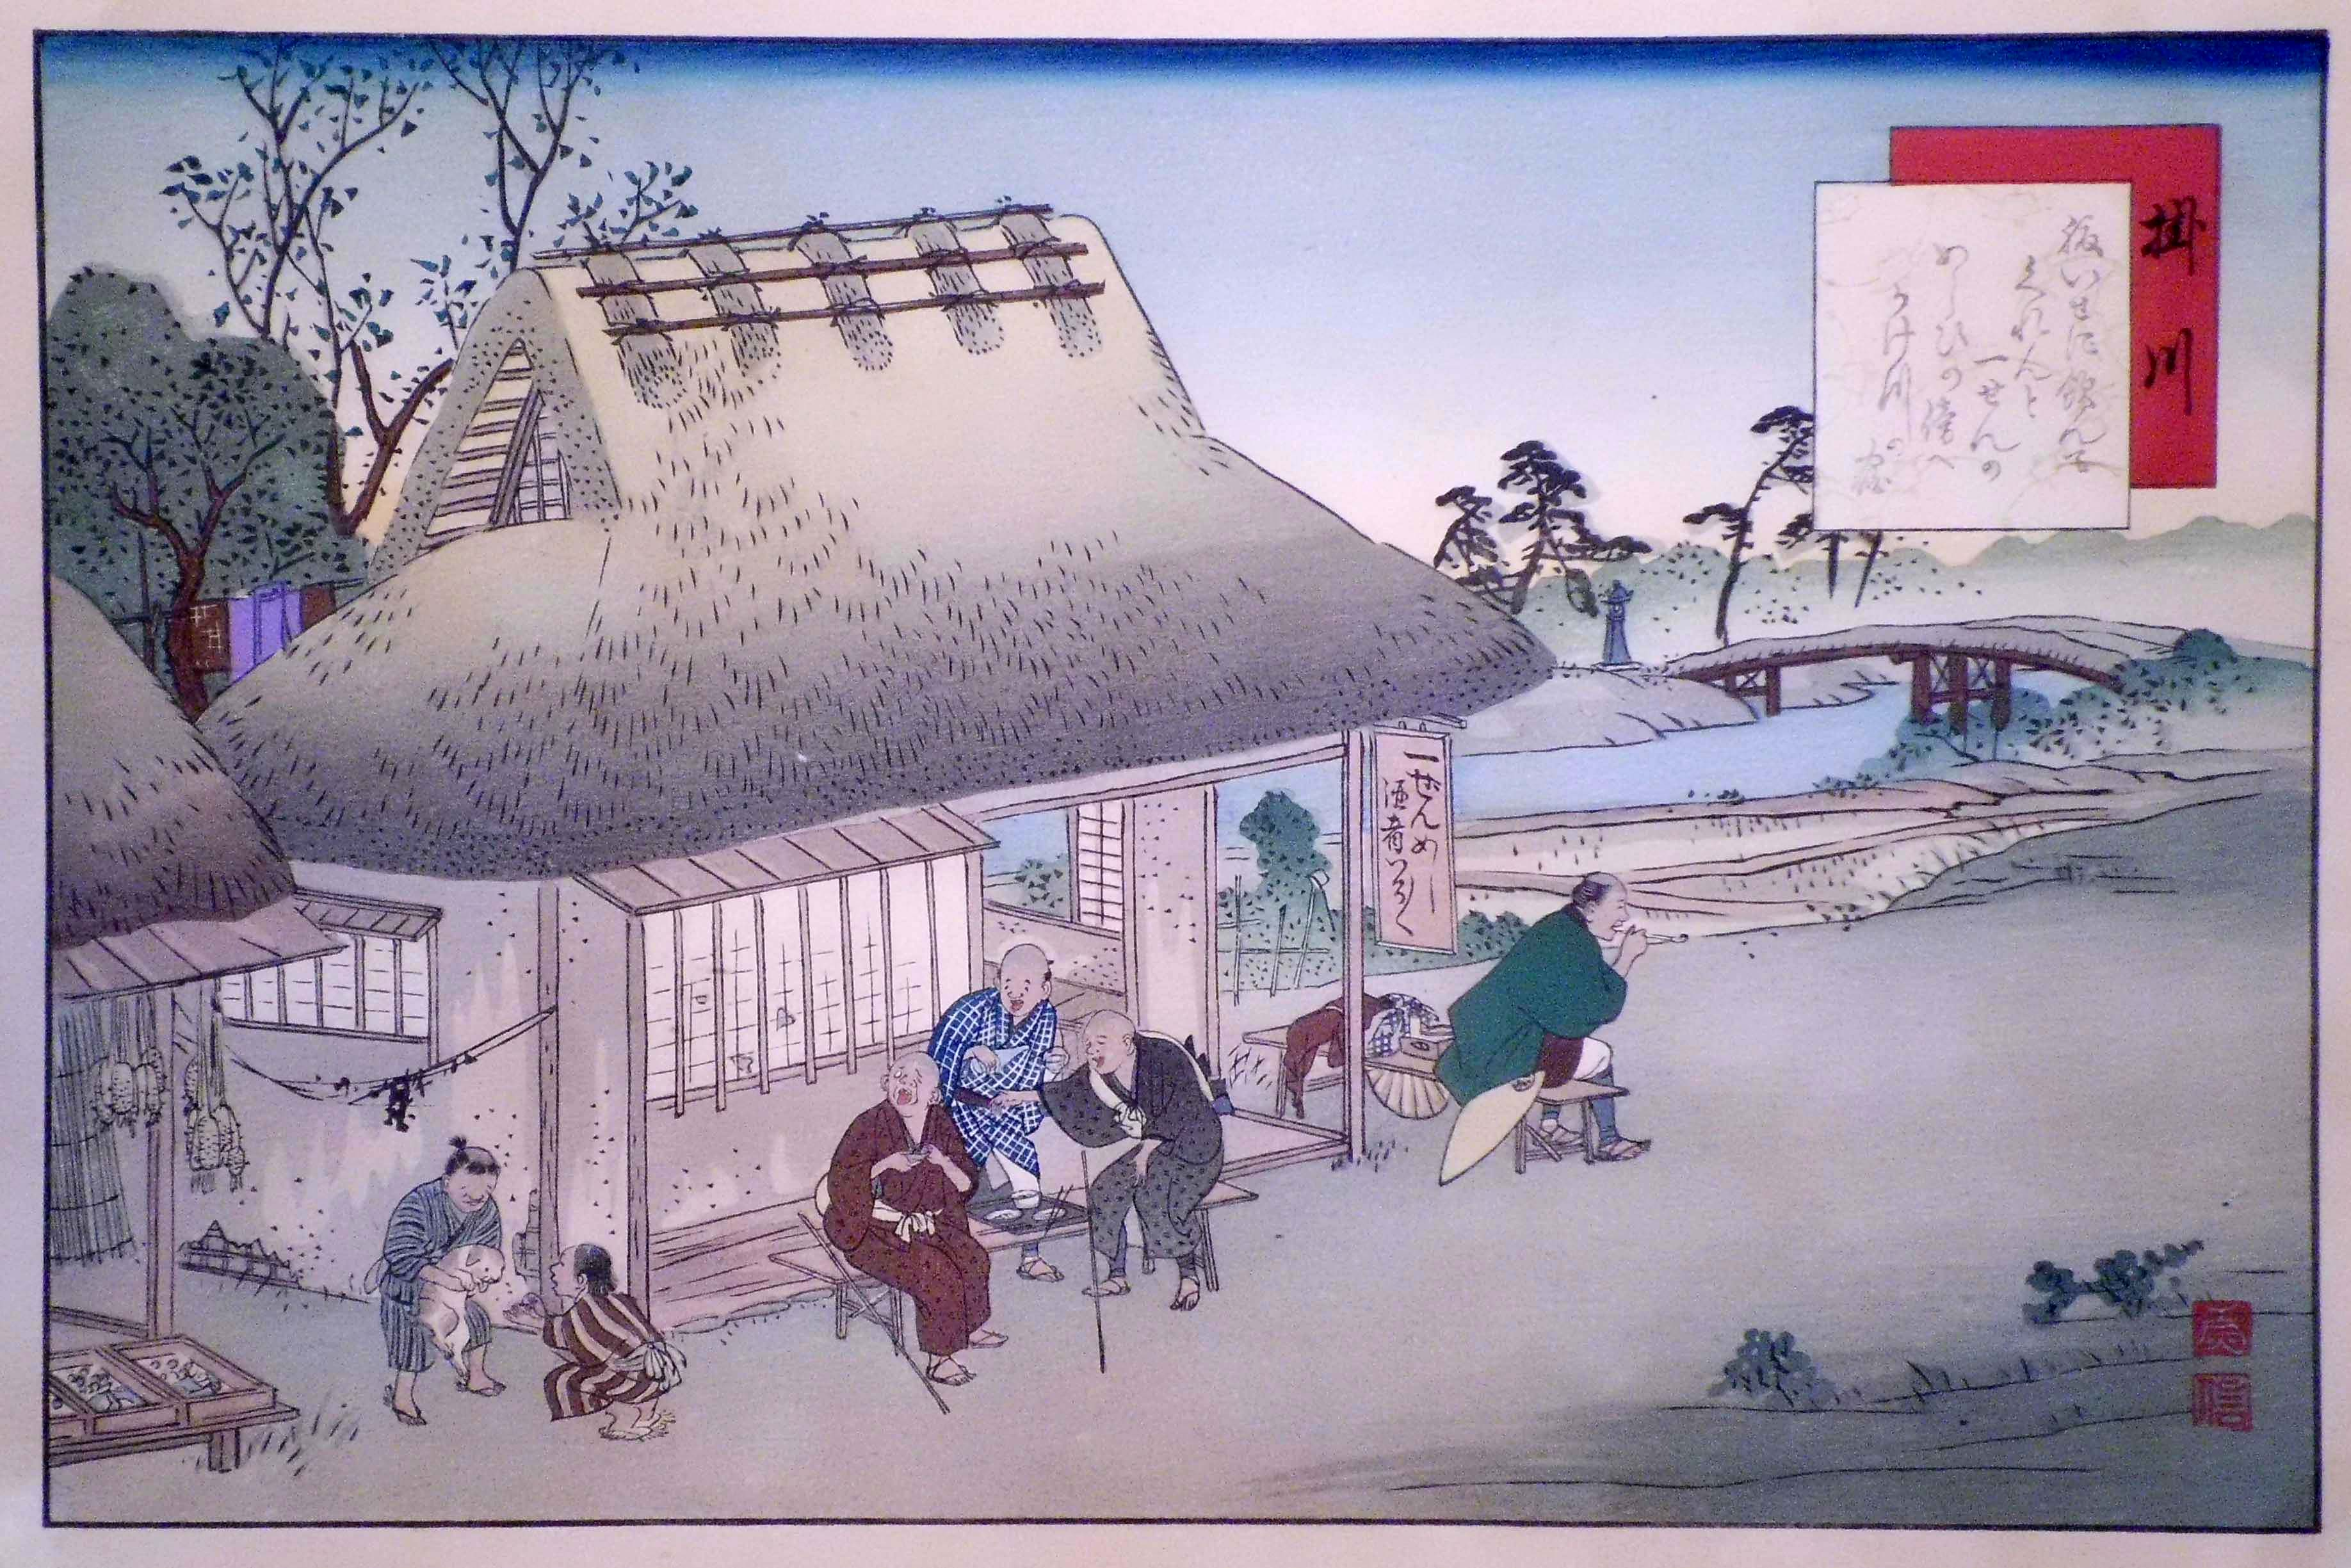 Fujikawa TAMENOBU (attivo nel 1890/1914) – KAKEGAWA, VENTISEIESIMA STAZIONE DELLA TOKAIDO